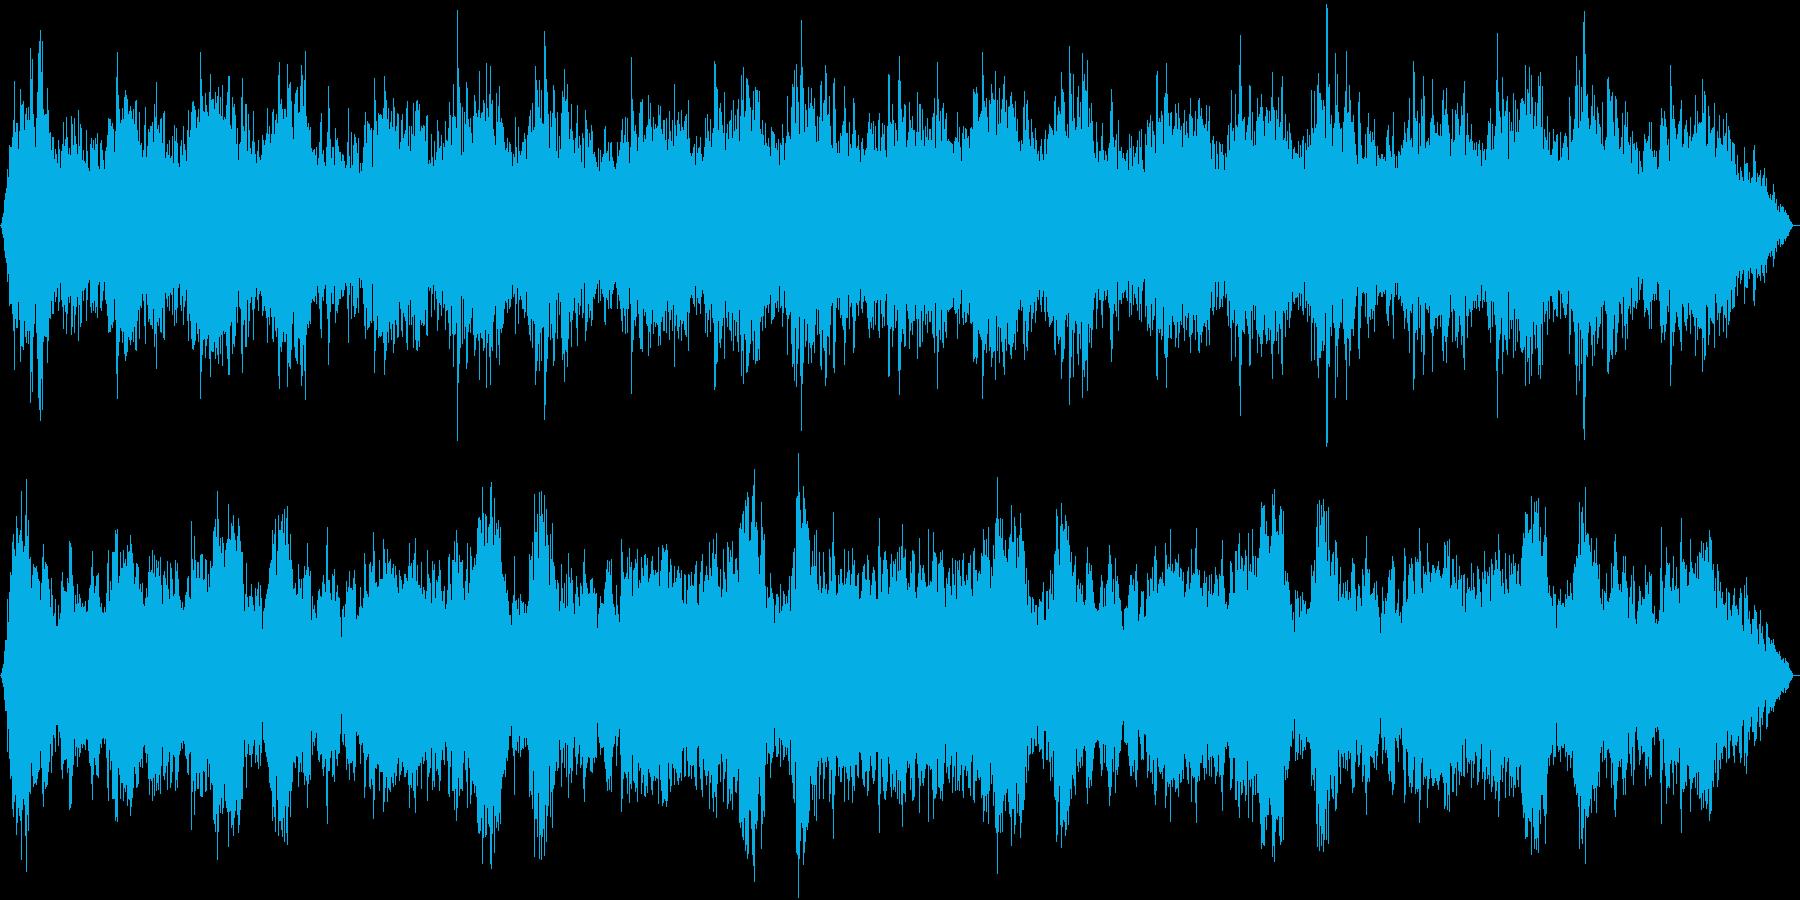 魔法詠唱、魔法発動、独白 15の再生済みの波形